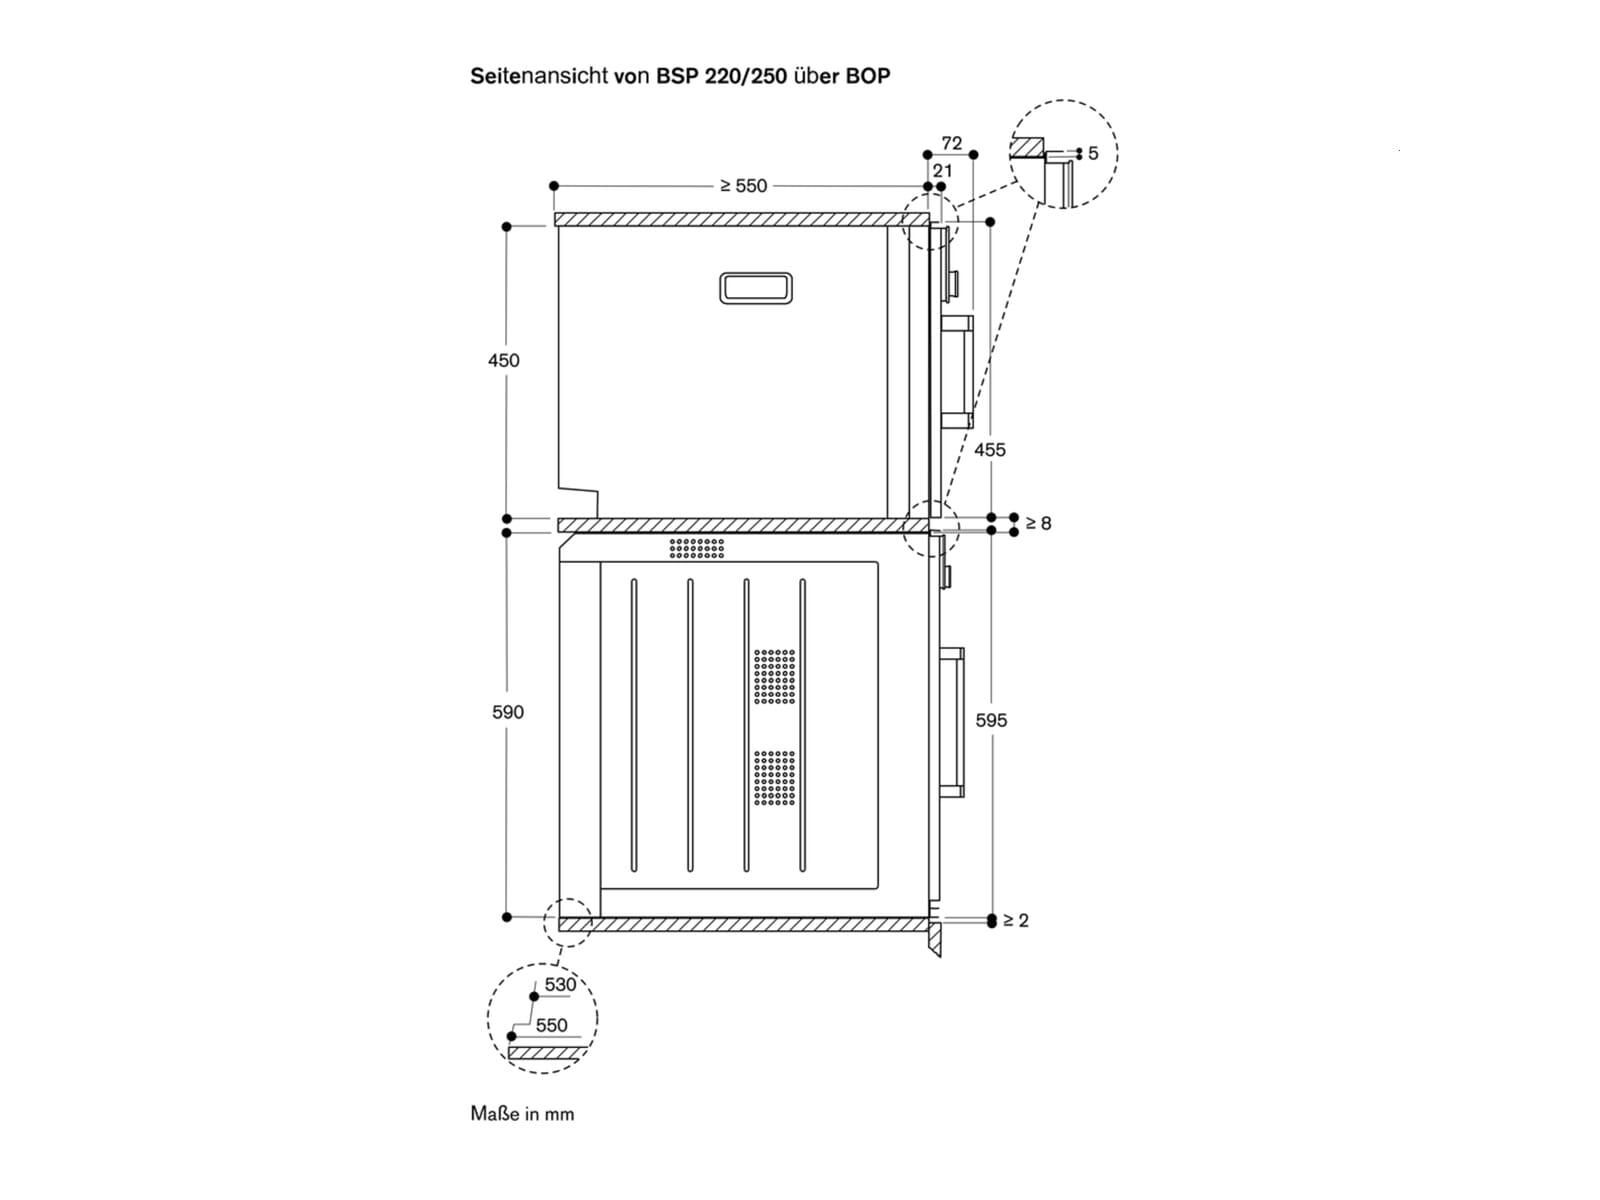 Gaggenau BSP 221 101 Dampfgarer Serie 200 Anthrazit